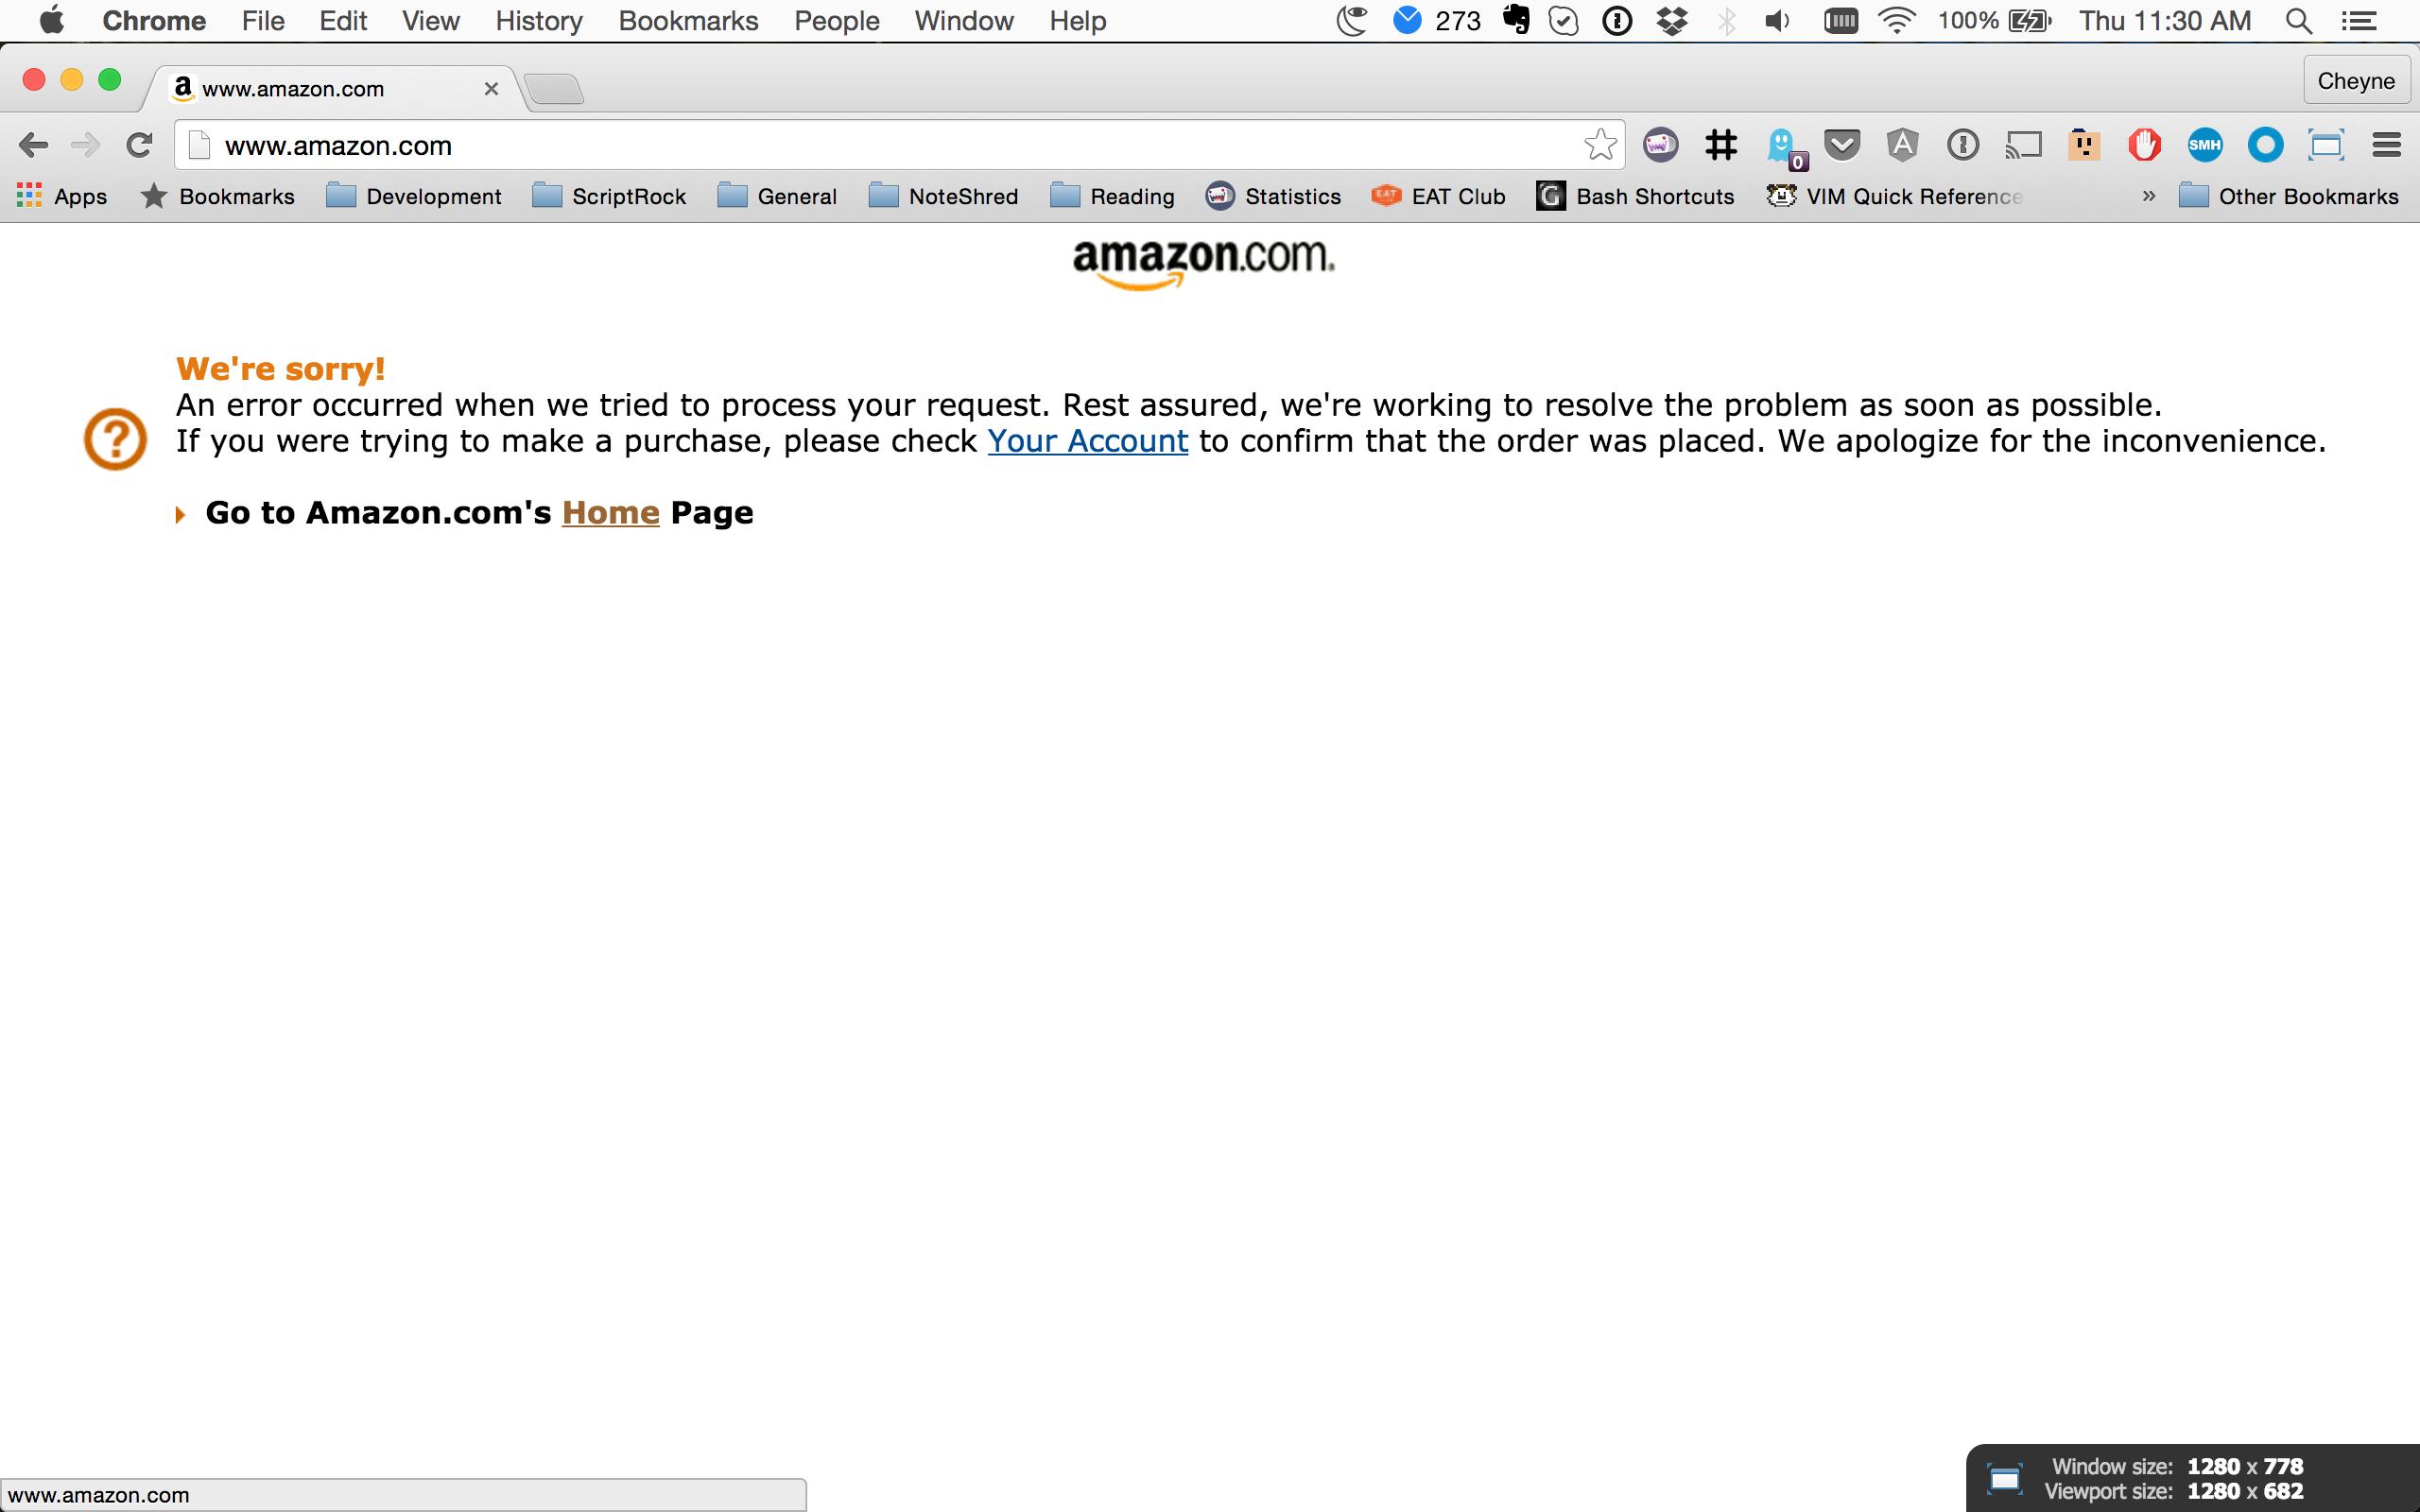 Amazon.com Homepage Error